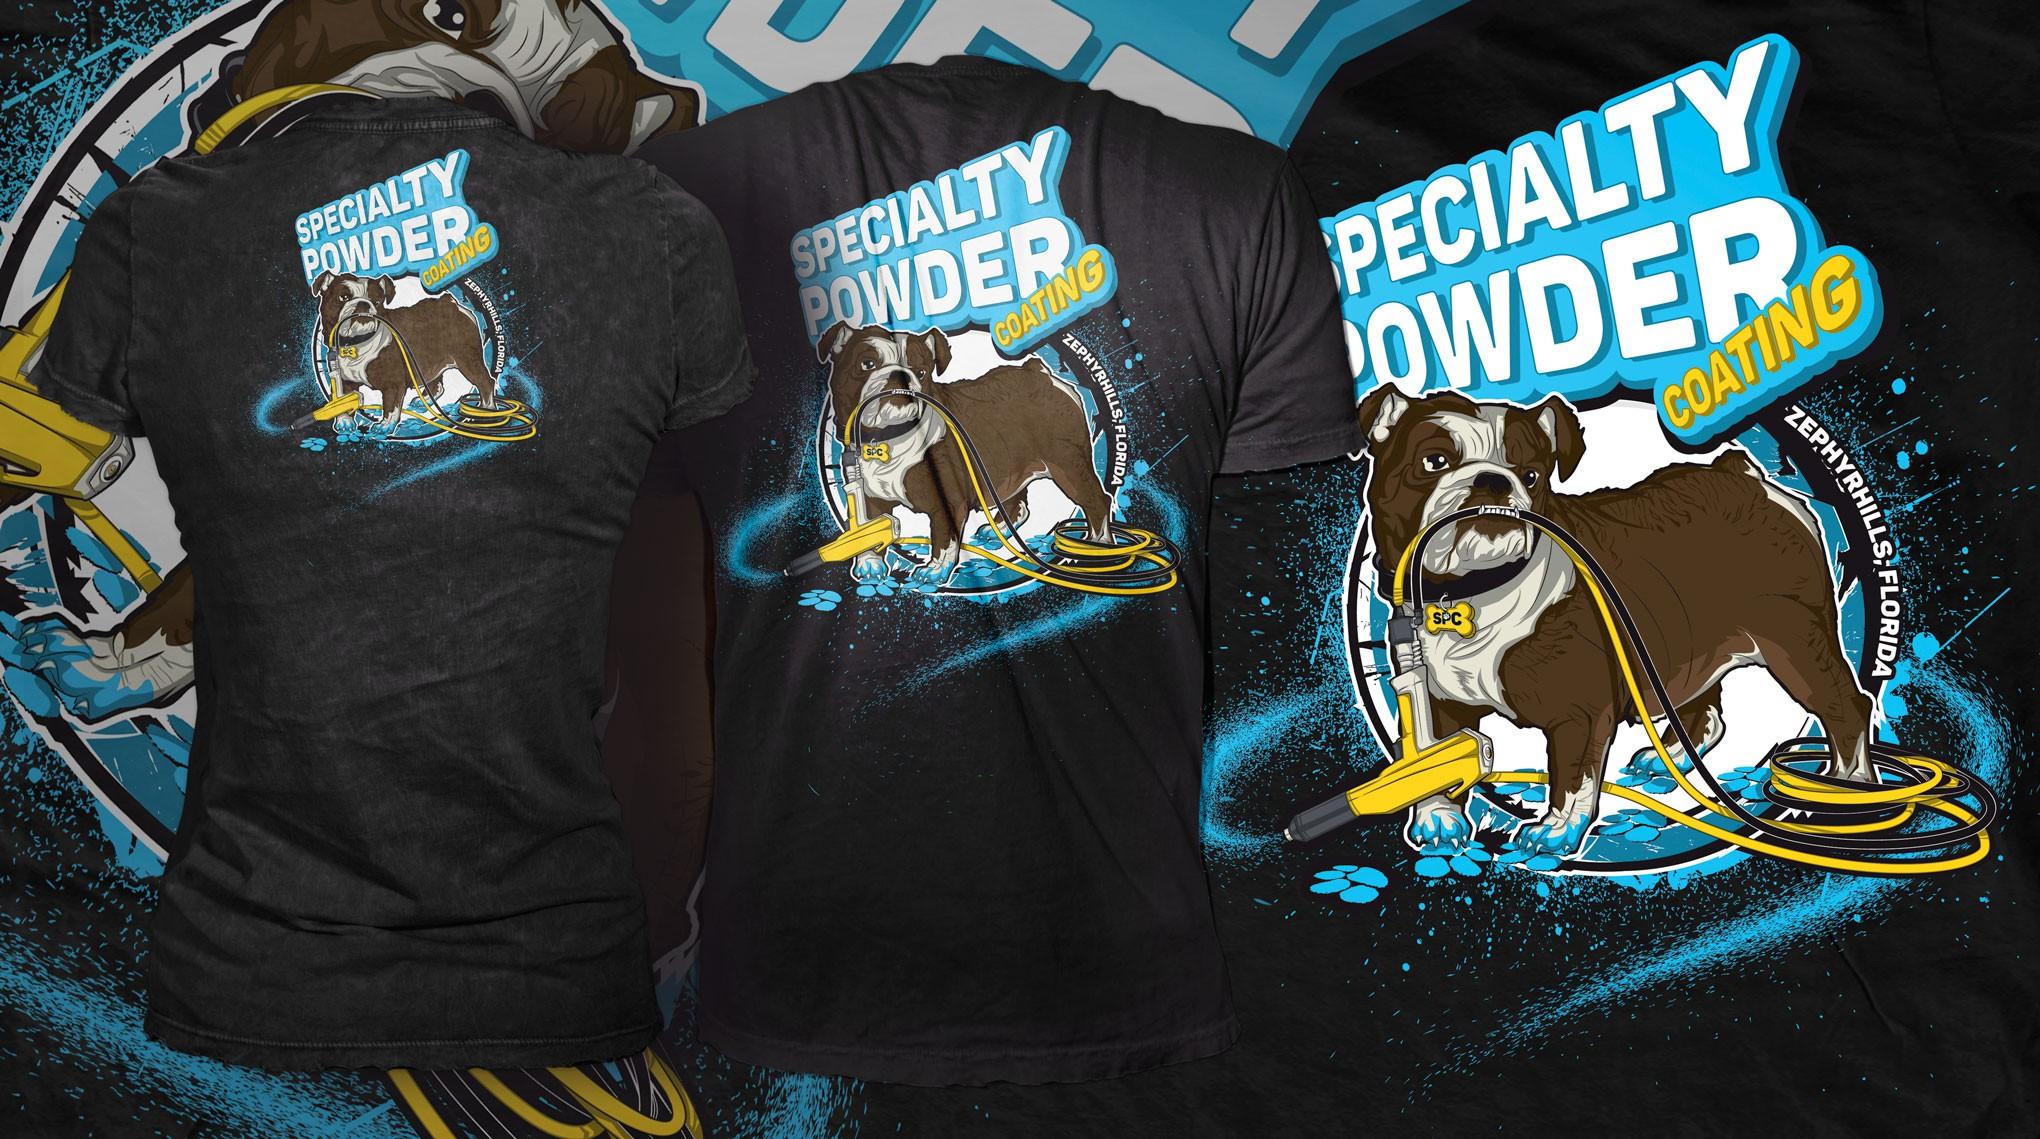 Bulldog mascot for Specialty Powder Coating